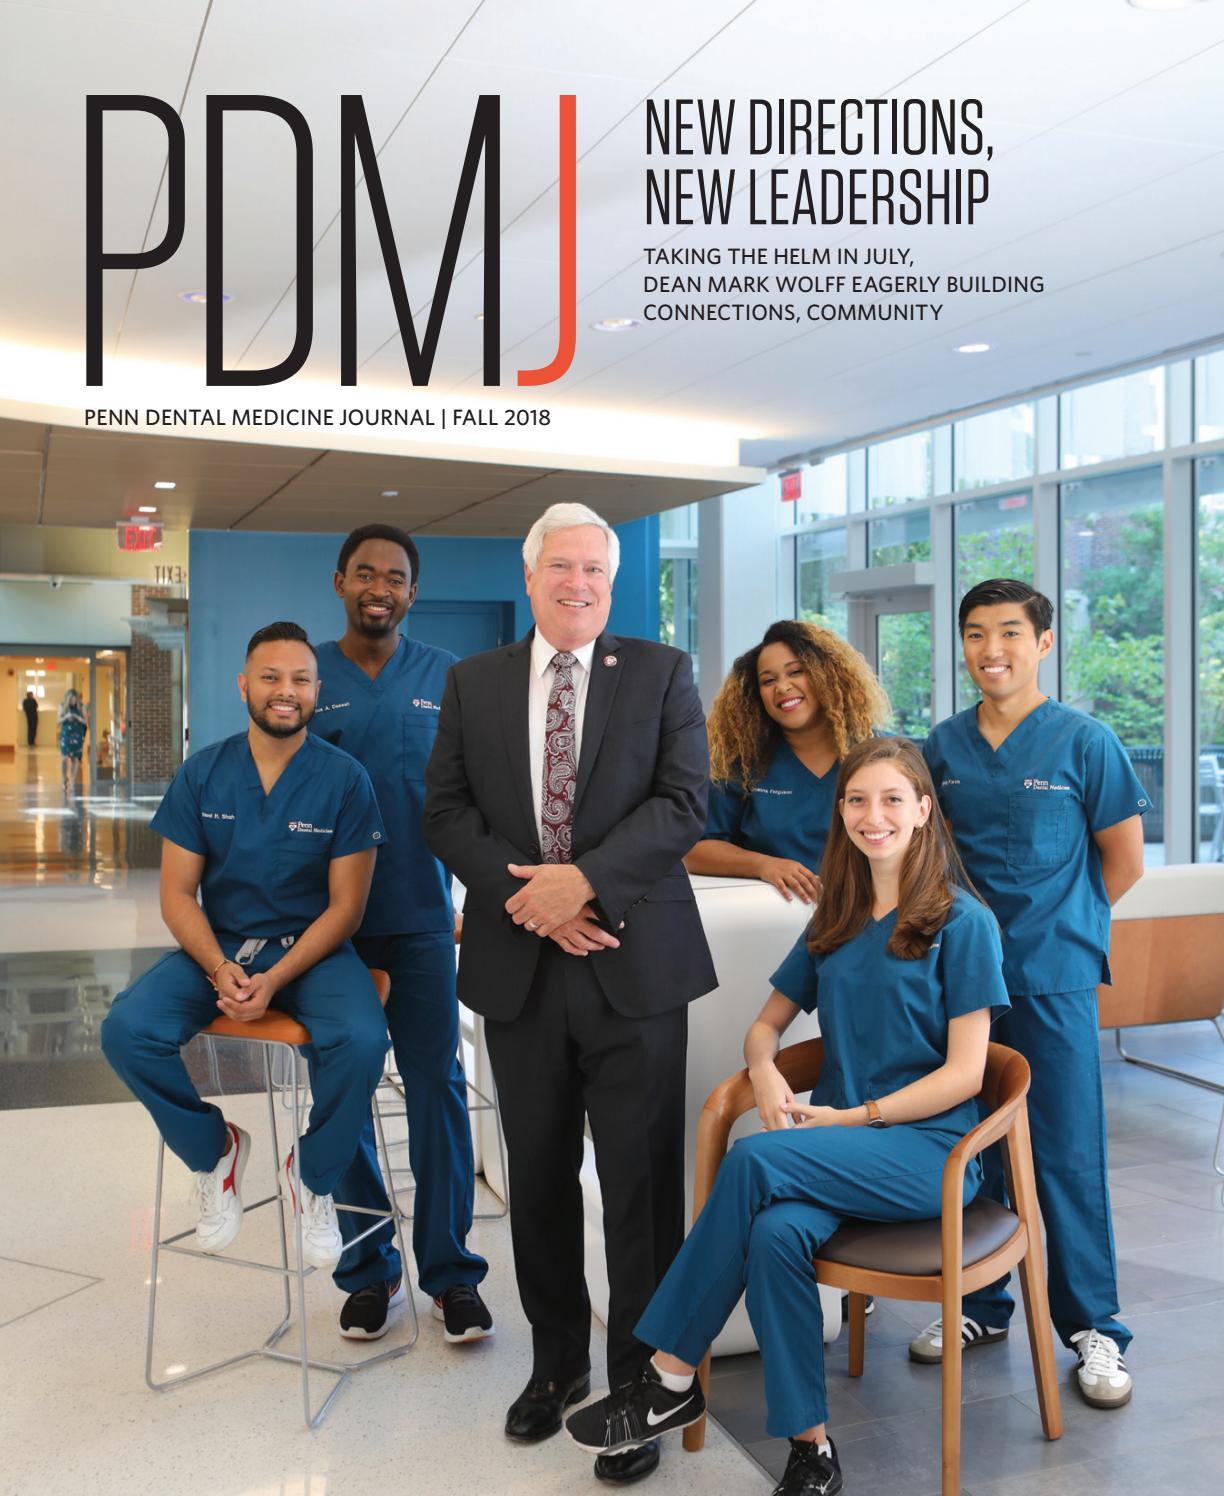 Penn Dental Medicine Journal Fall 2018 By Penn Dental Medicine Issuu